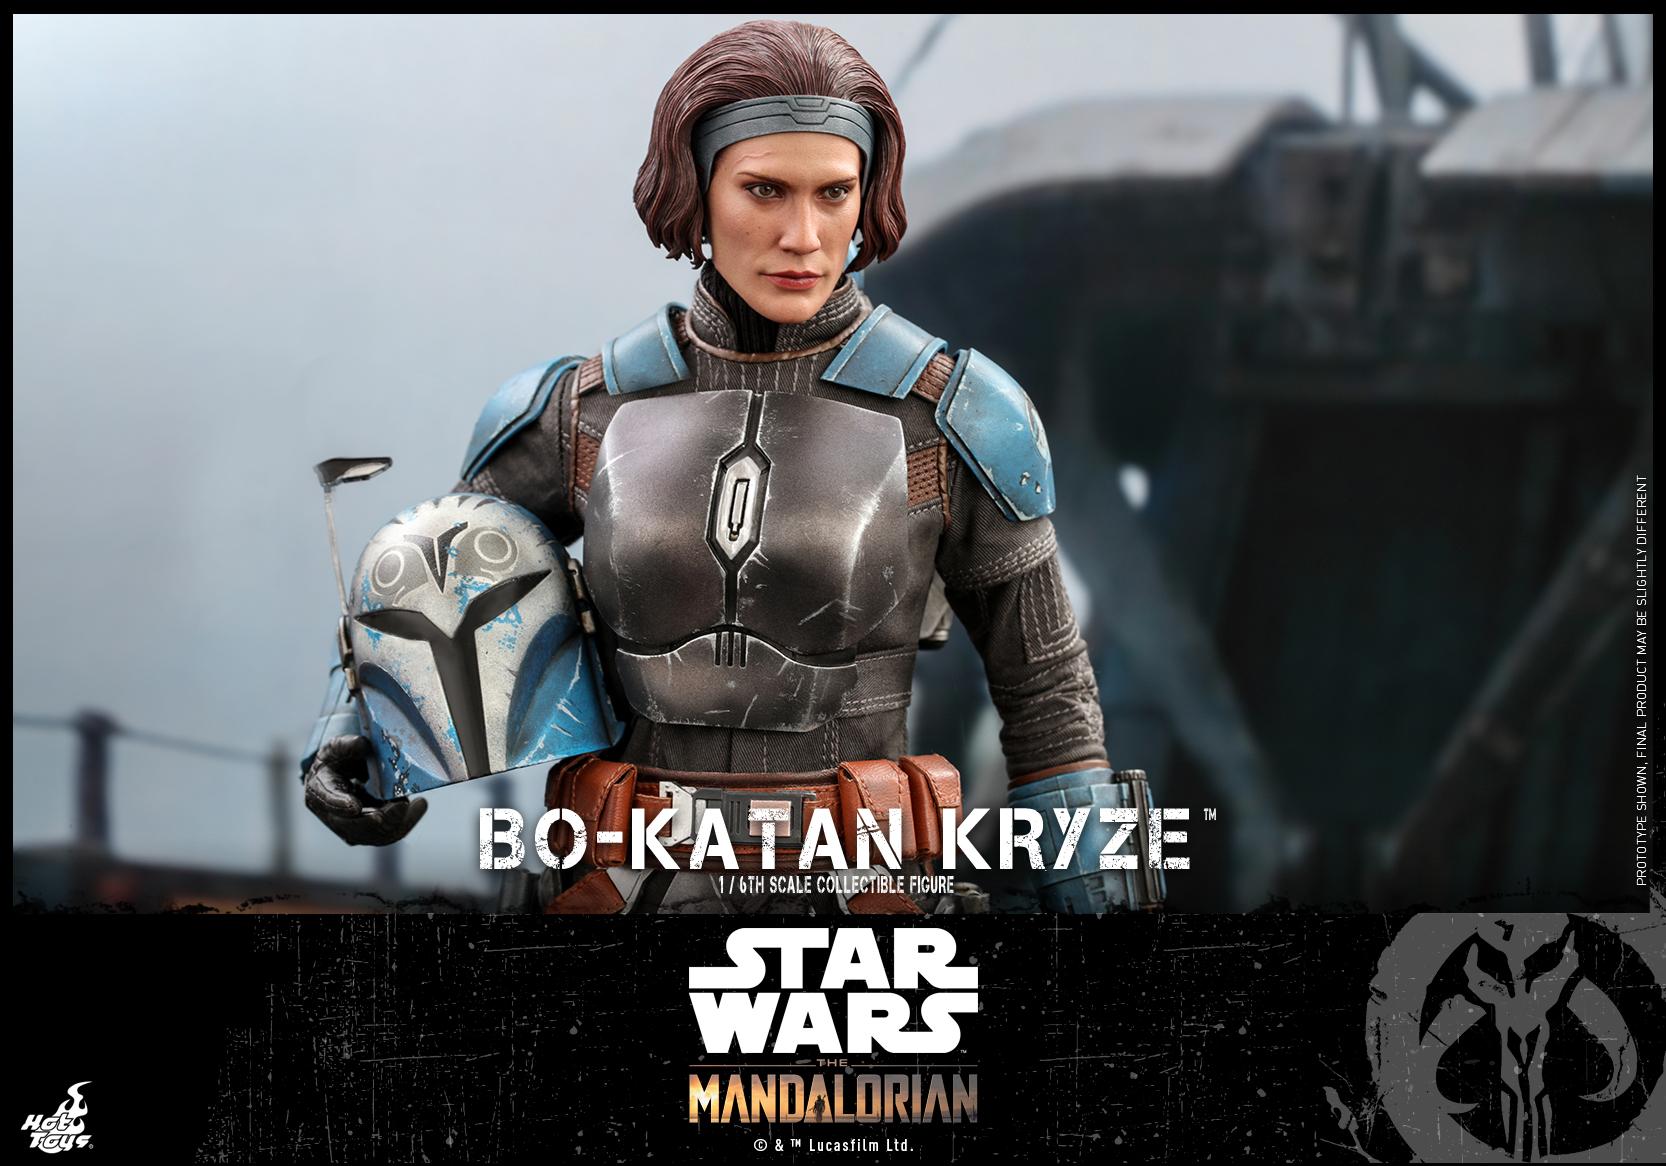 Hot Toys - The Mandalorian (S2) - Bo-Katan Kryze Collectible Figure_PR13